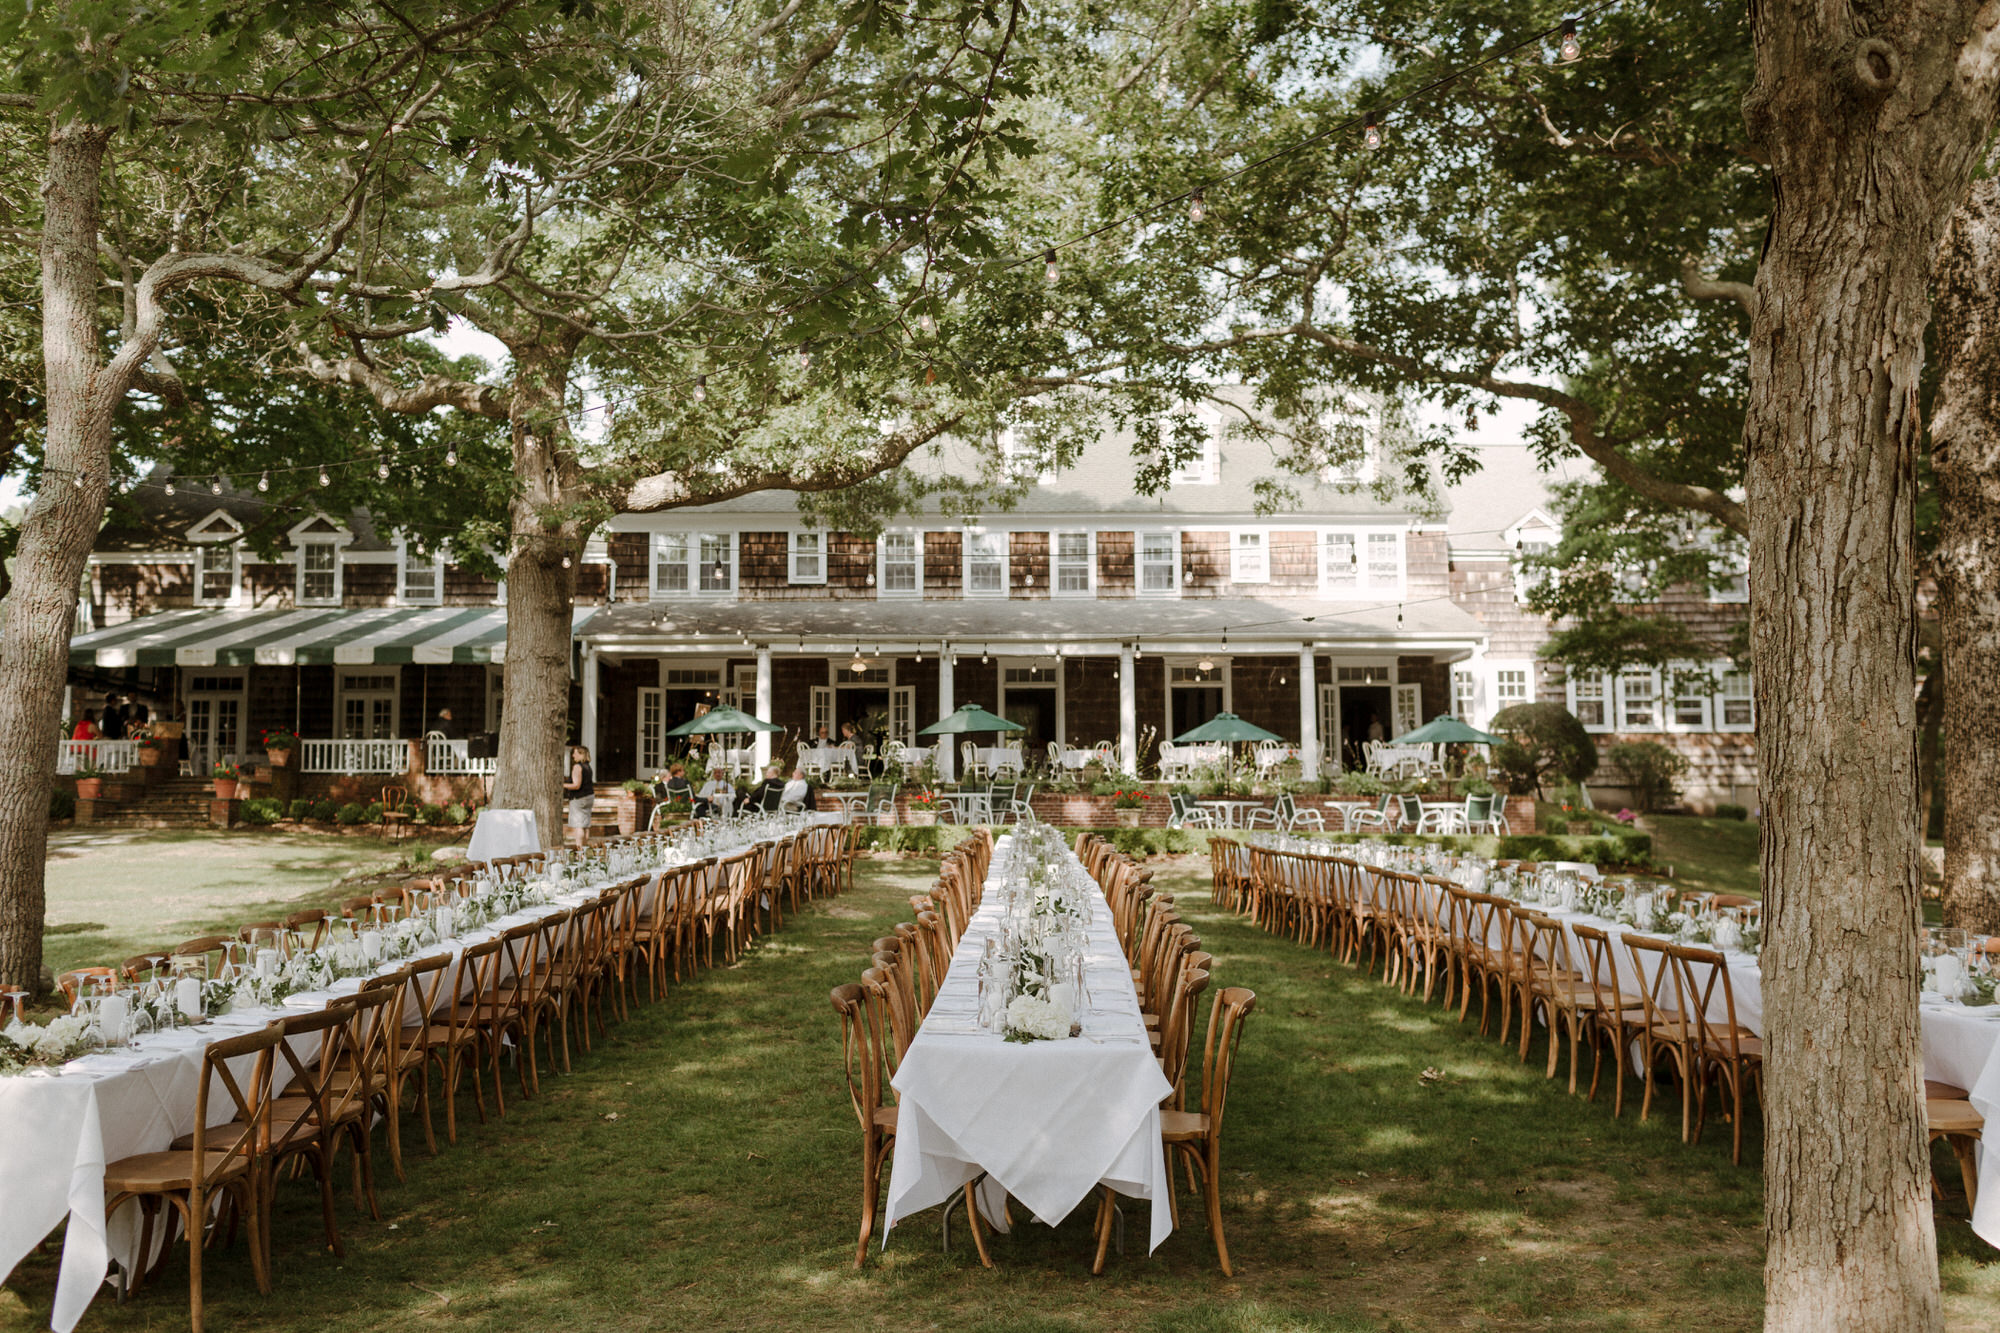 163_Rams Head Inn wedding photography, Shelter Island, New York_Island Wedding.jpg